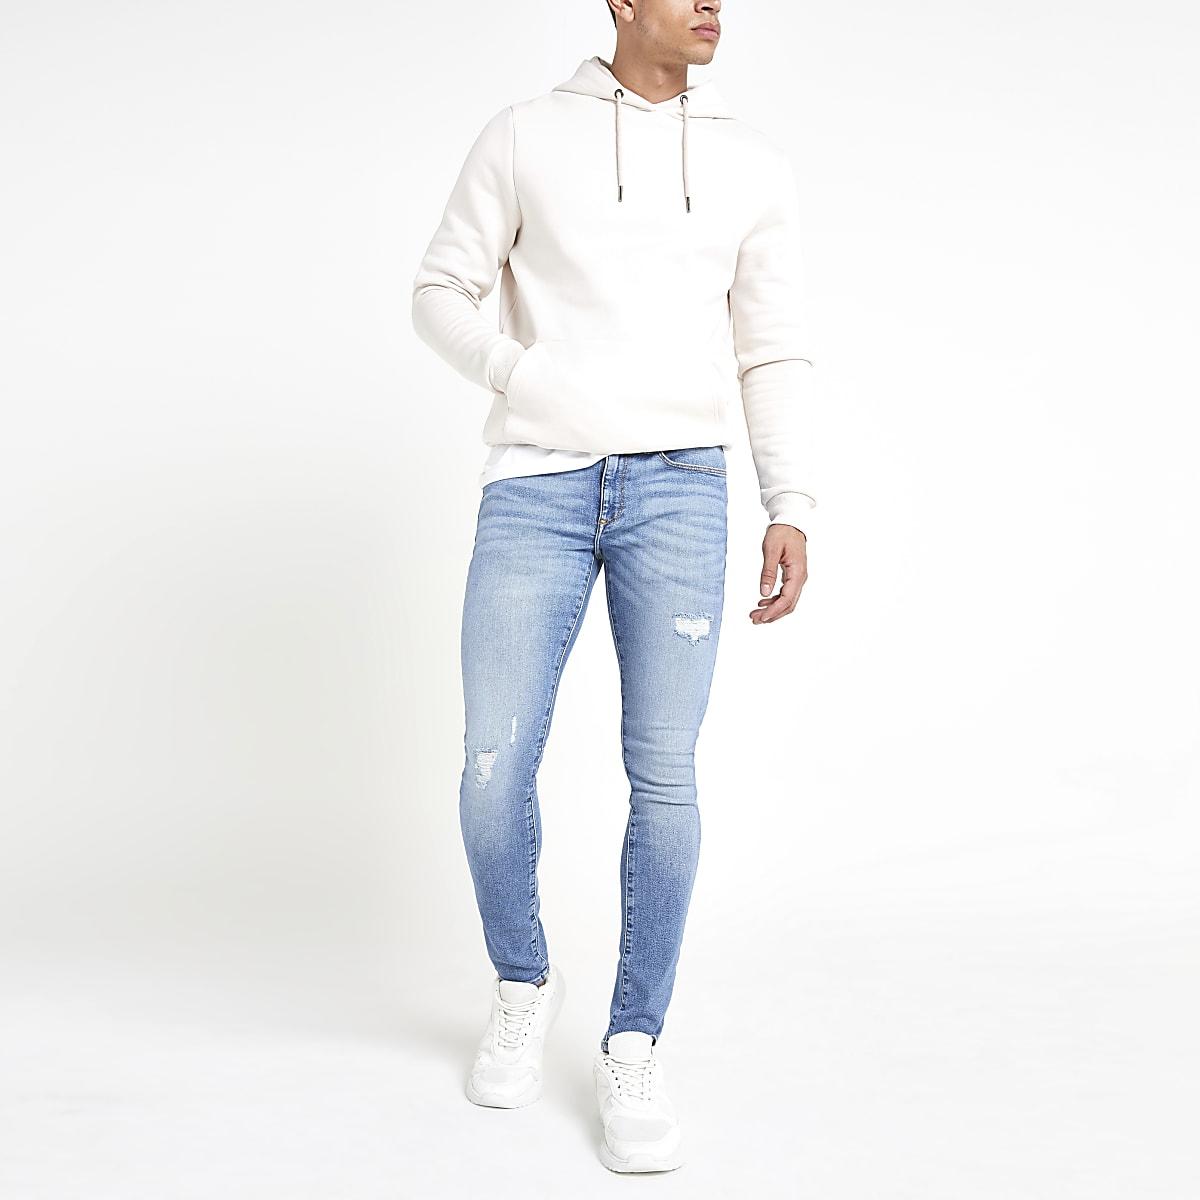 Danny – Helle Super Skinny Jeans